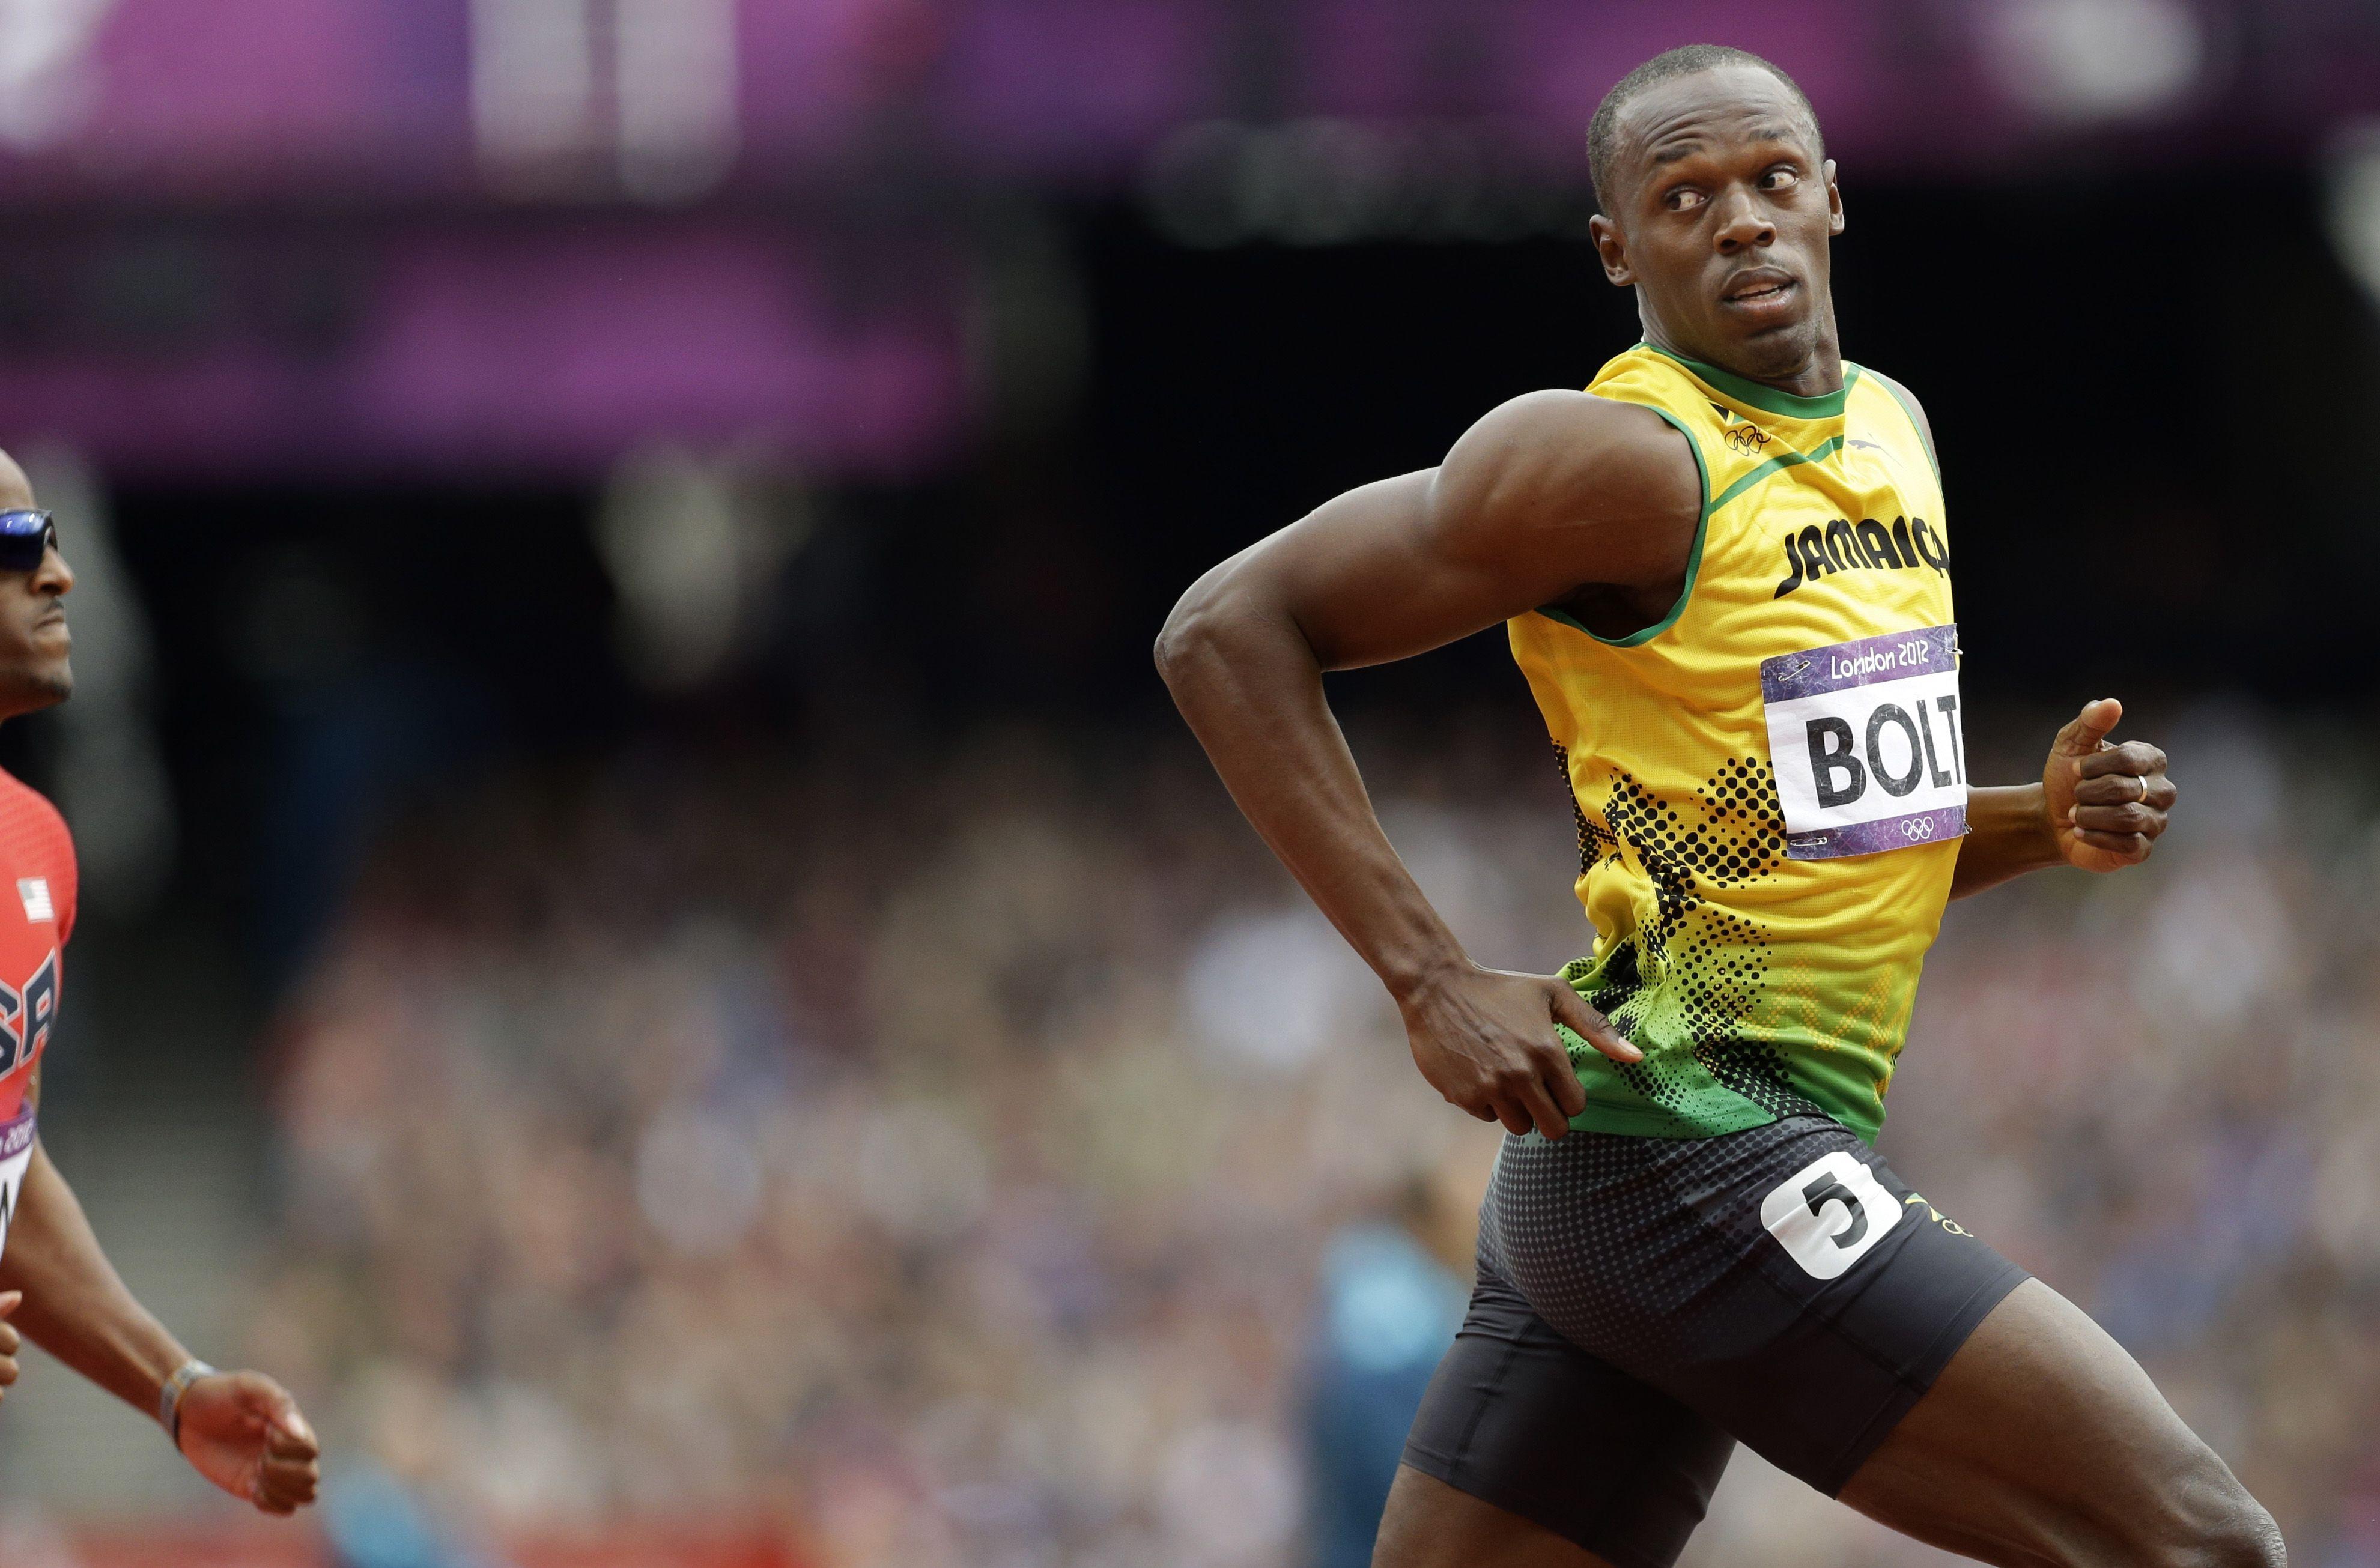 11 Usain Bolt HD Wallpapers Backgrounds 3962x2611